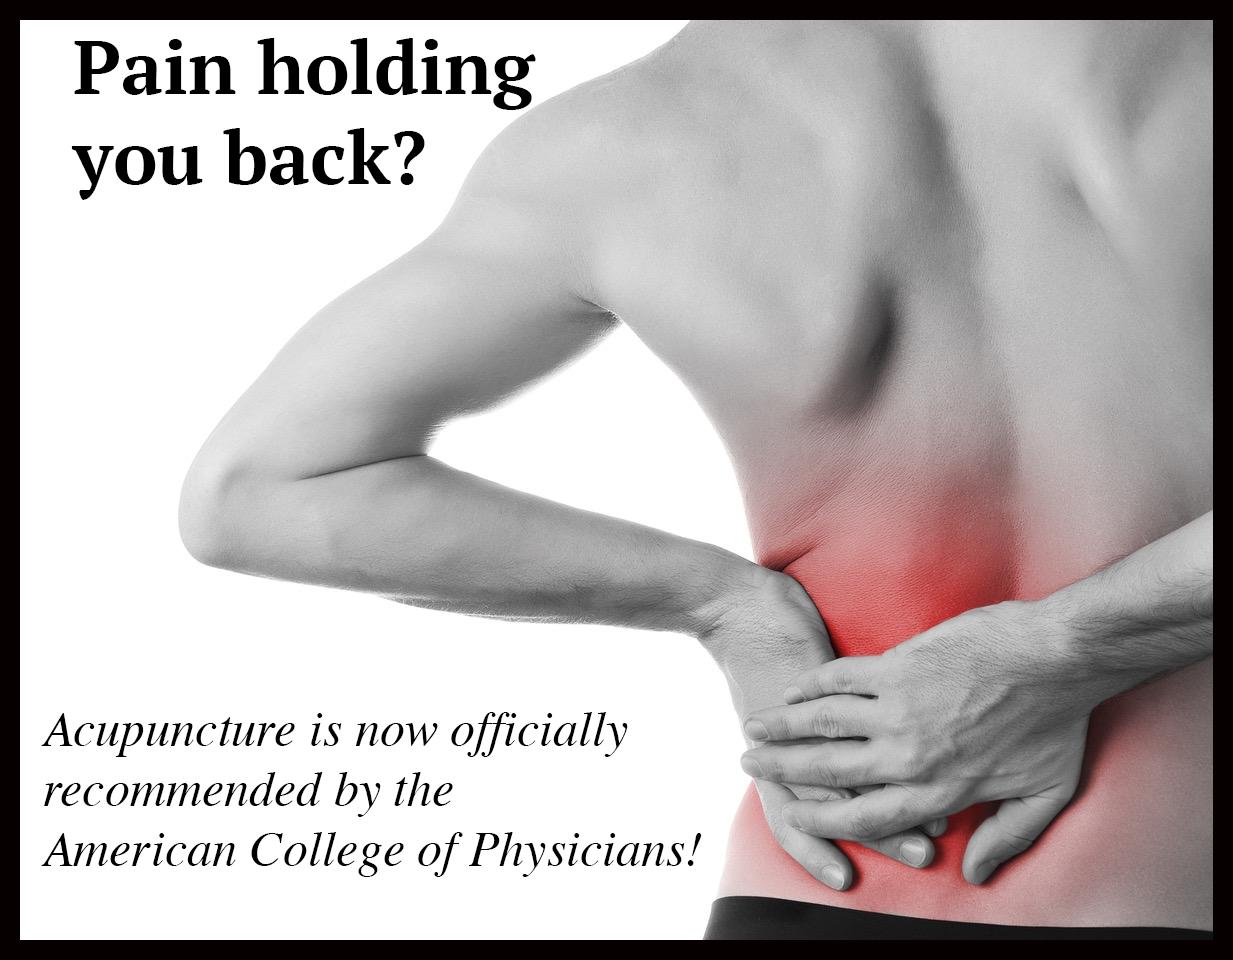 EvidenceForAcupunctureLowBackPain.png